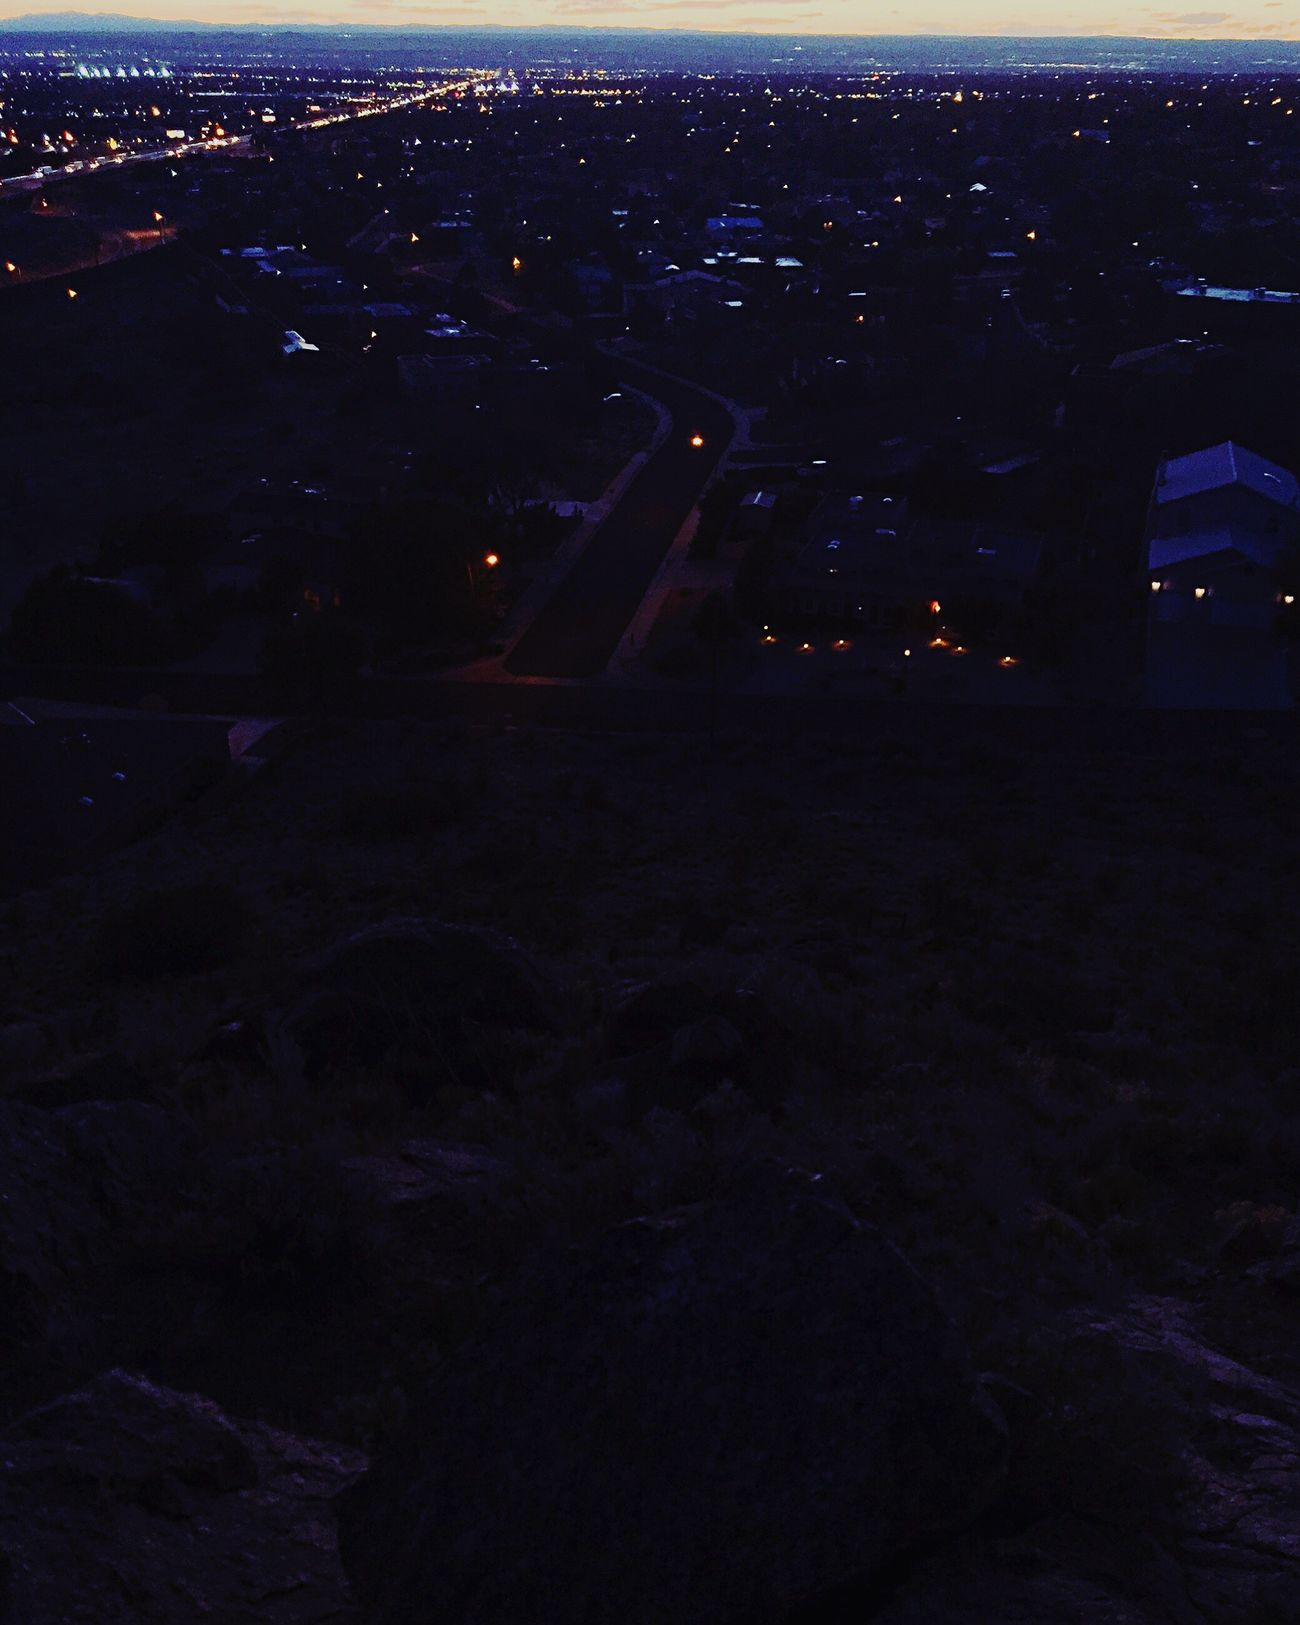 Albuquerque New Mexico Mountains Suburban Landscape Suburbia Landscape City Photography Neighborhood Foothills Southwest  Cityscape Landofenchantment Mountain Suburbs Sandia Mountains Photographyislife Photographylovers Photography Themes Sunset Dusk City Lights Abq Nightphotography Night Lights